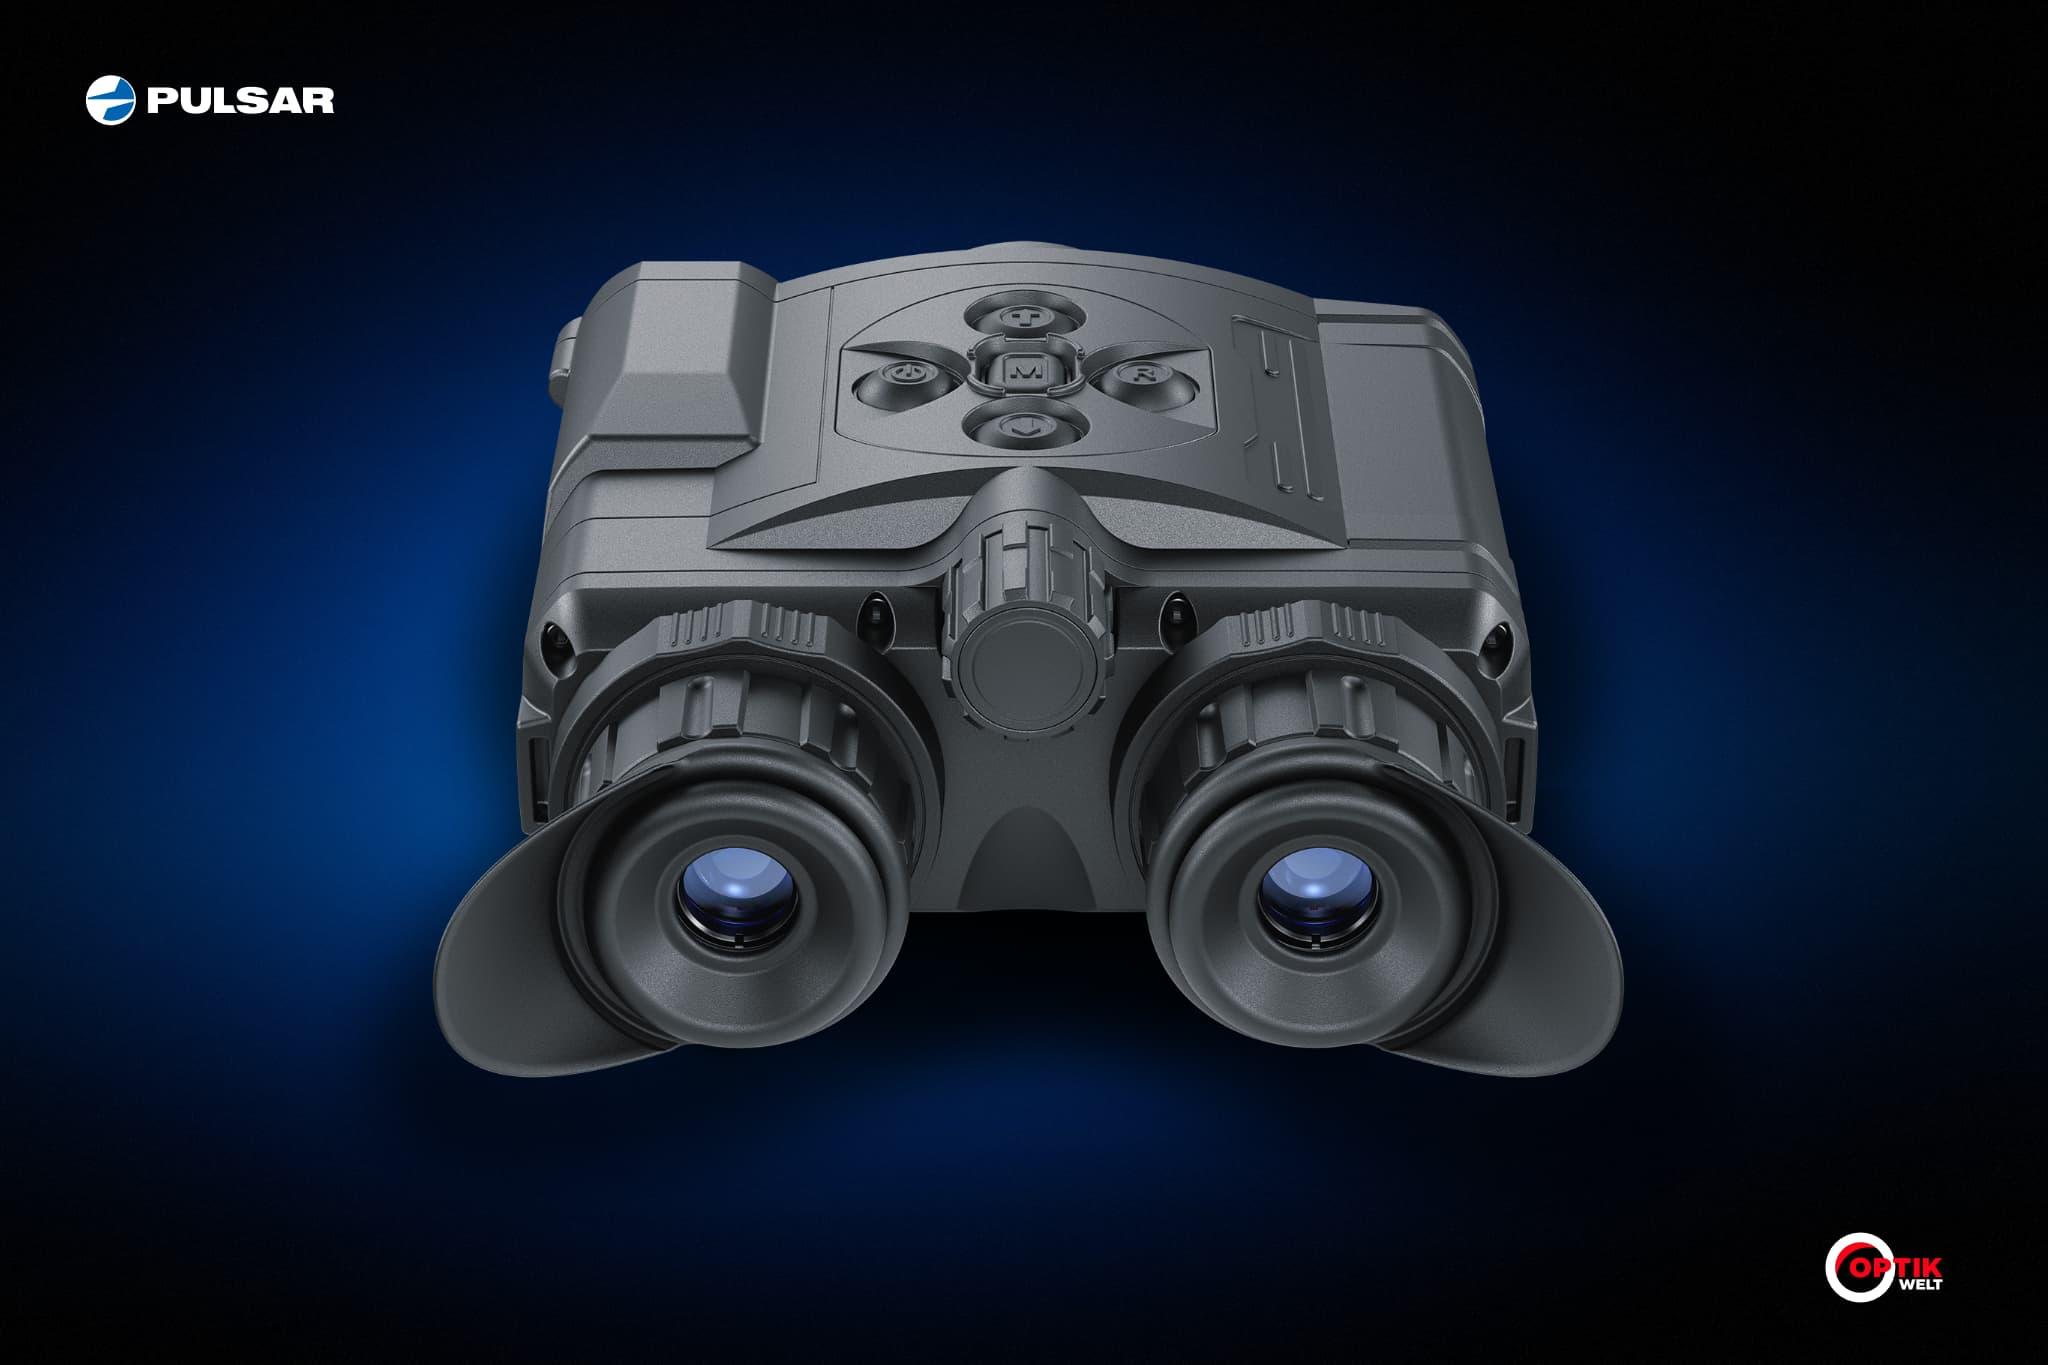 Termokaamera Pulsar Accolade LRF XP50